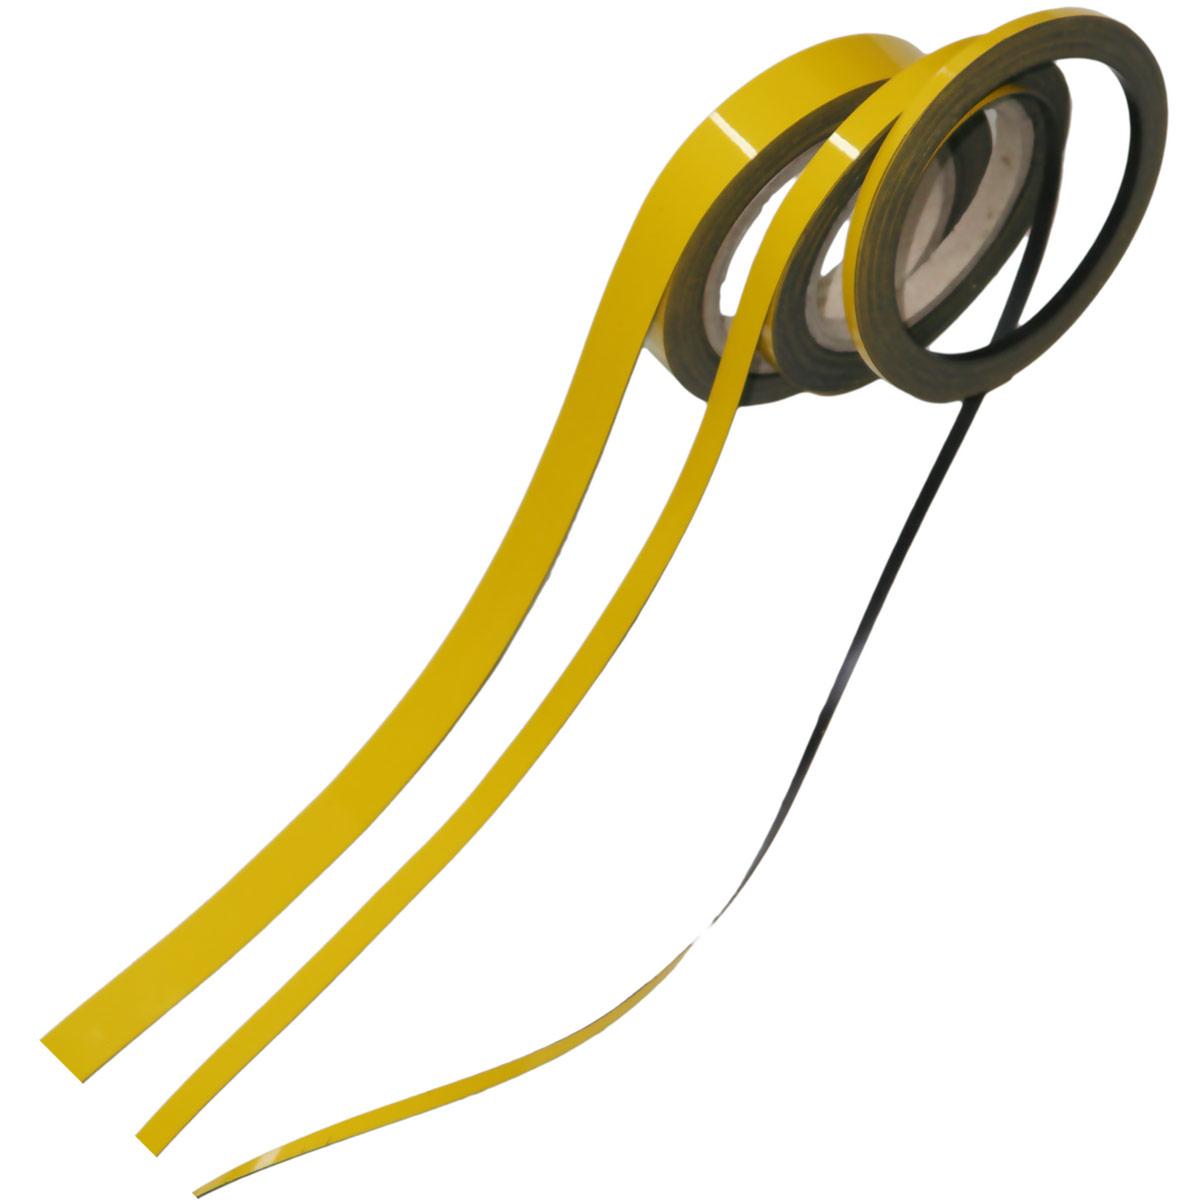 Magnetic strip Dimension: 0,5 cm x 1 m Thickness: 0,85 mm Colour ...